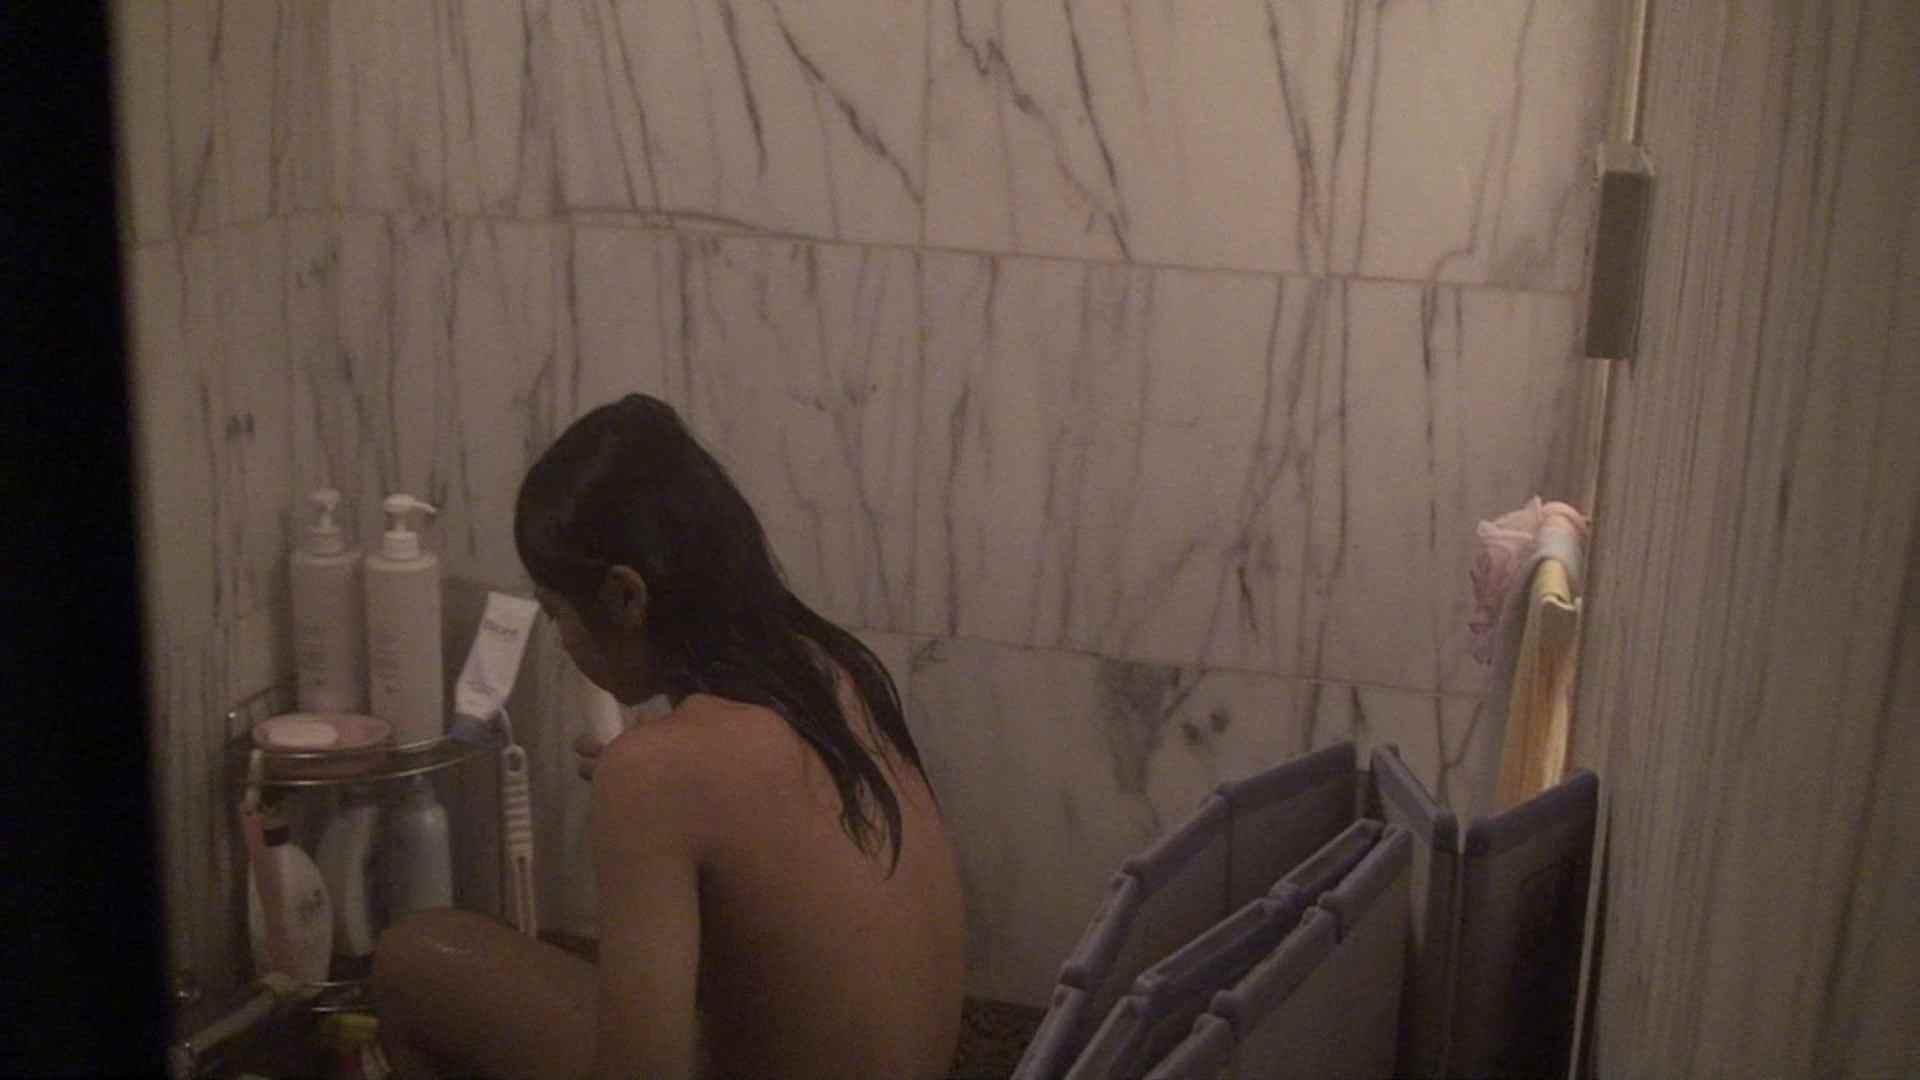 vol.03歌いながらつるつるのおっぱいを洗い流す彼女!近すぎてバレちゃた!? 美人編 AV無料 72画像 68